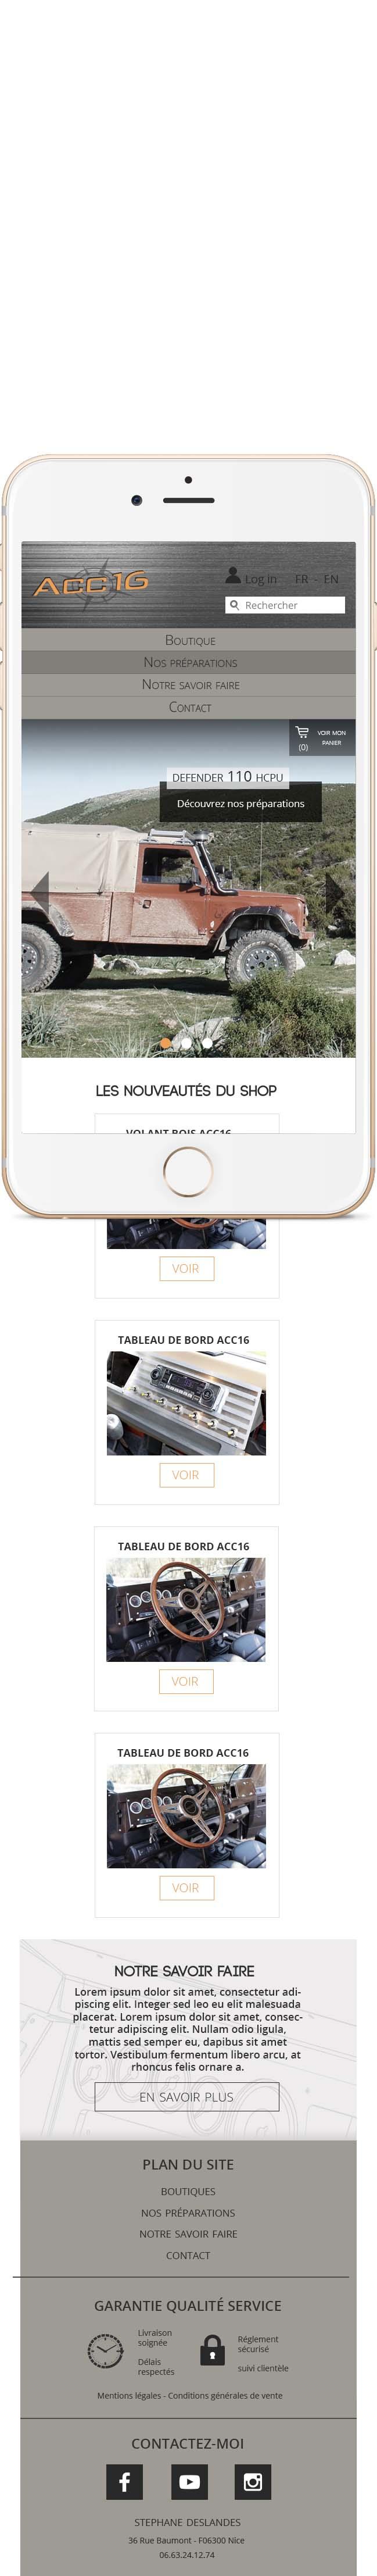 Homepage ACC16 en version mobile